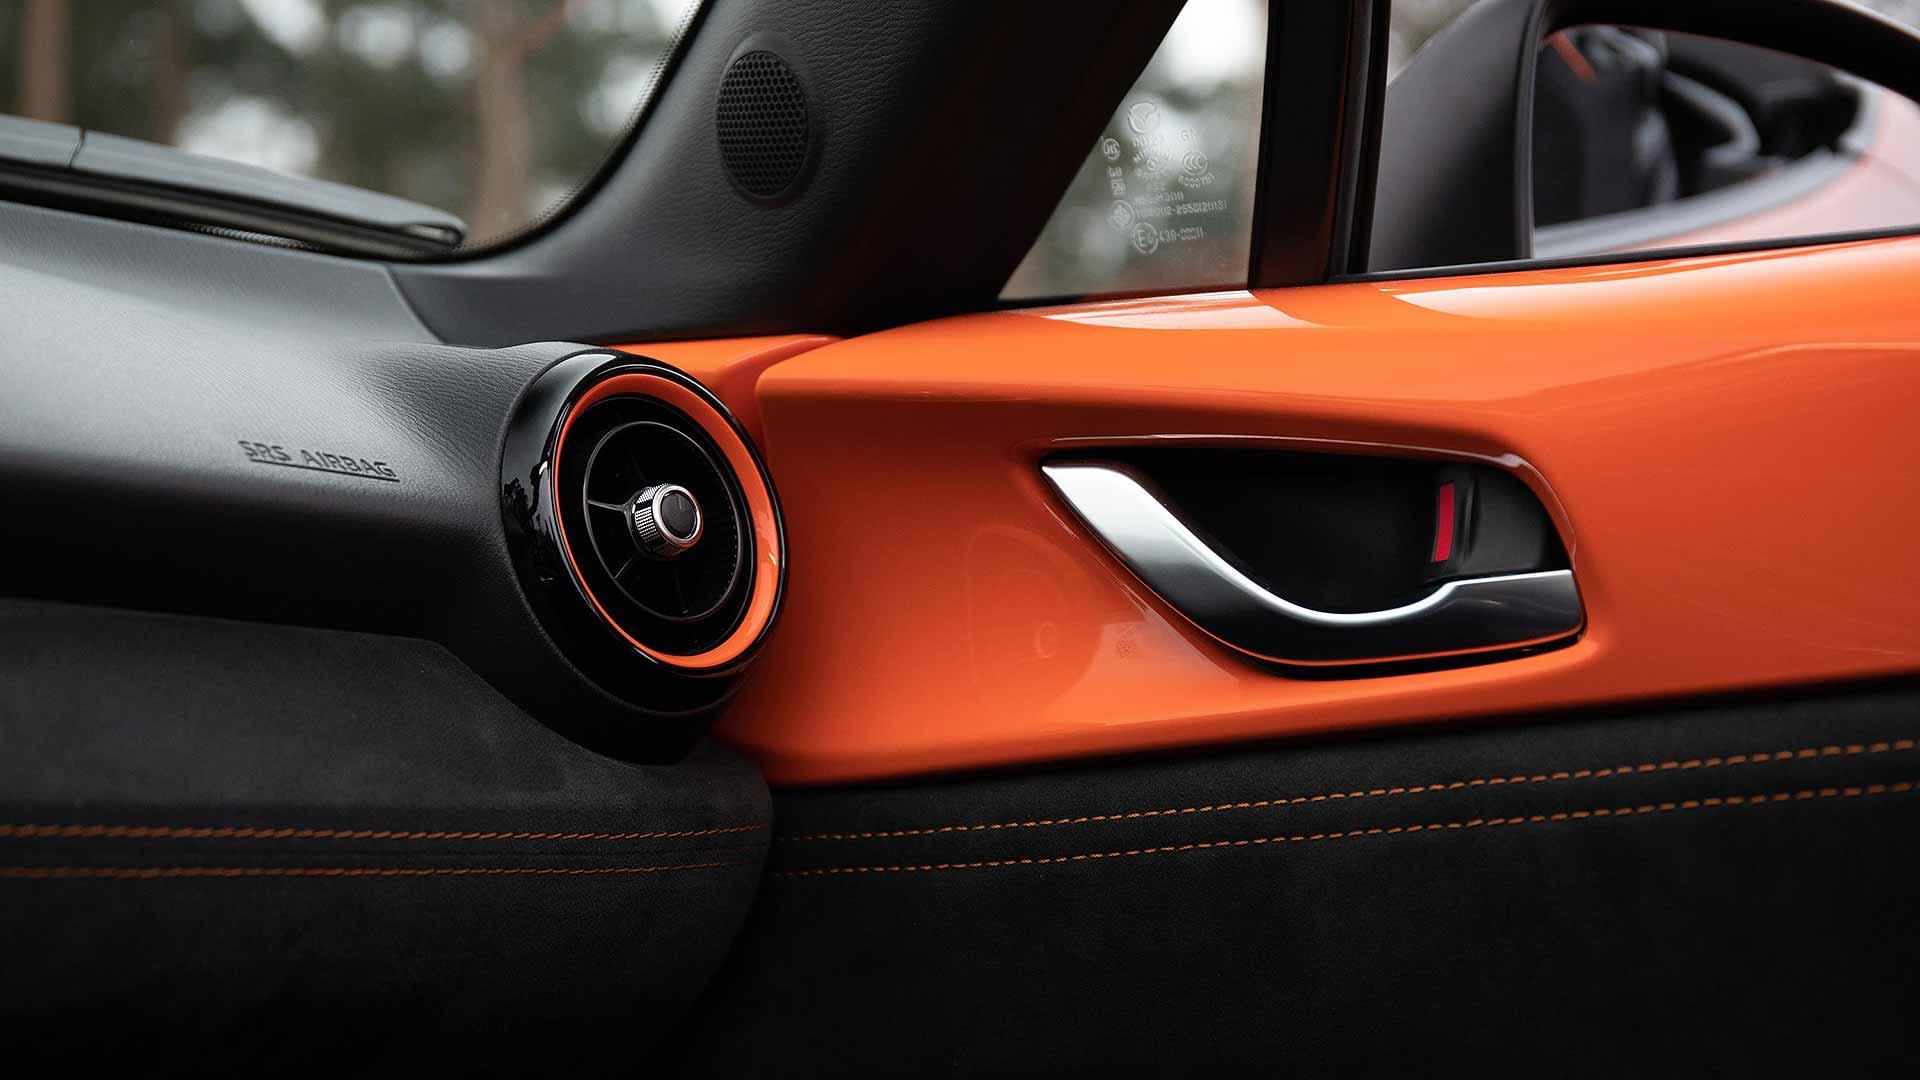 2019 Mazda MX-5 30th Anniversary